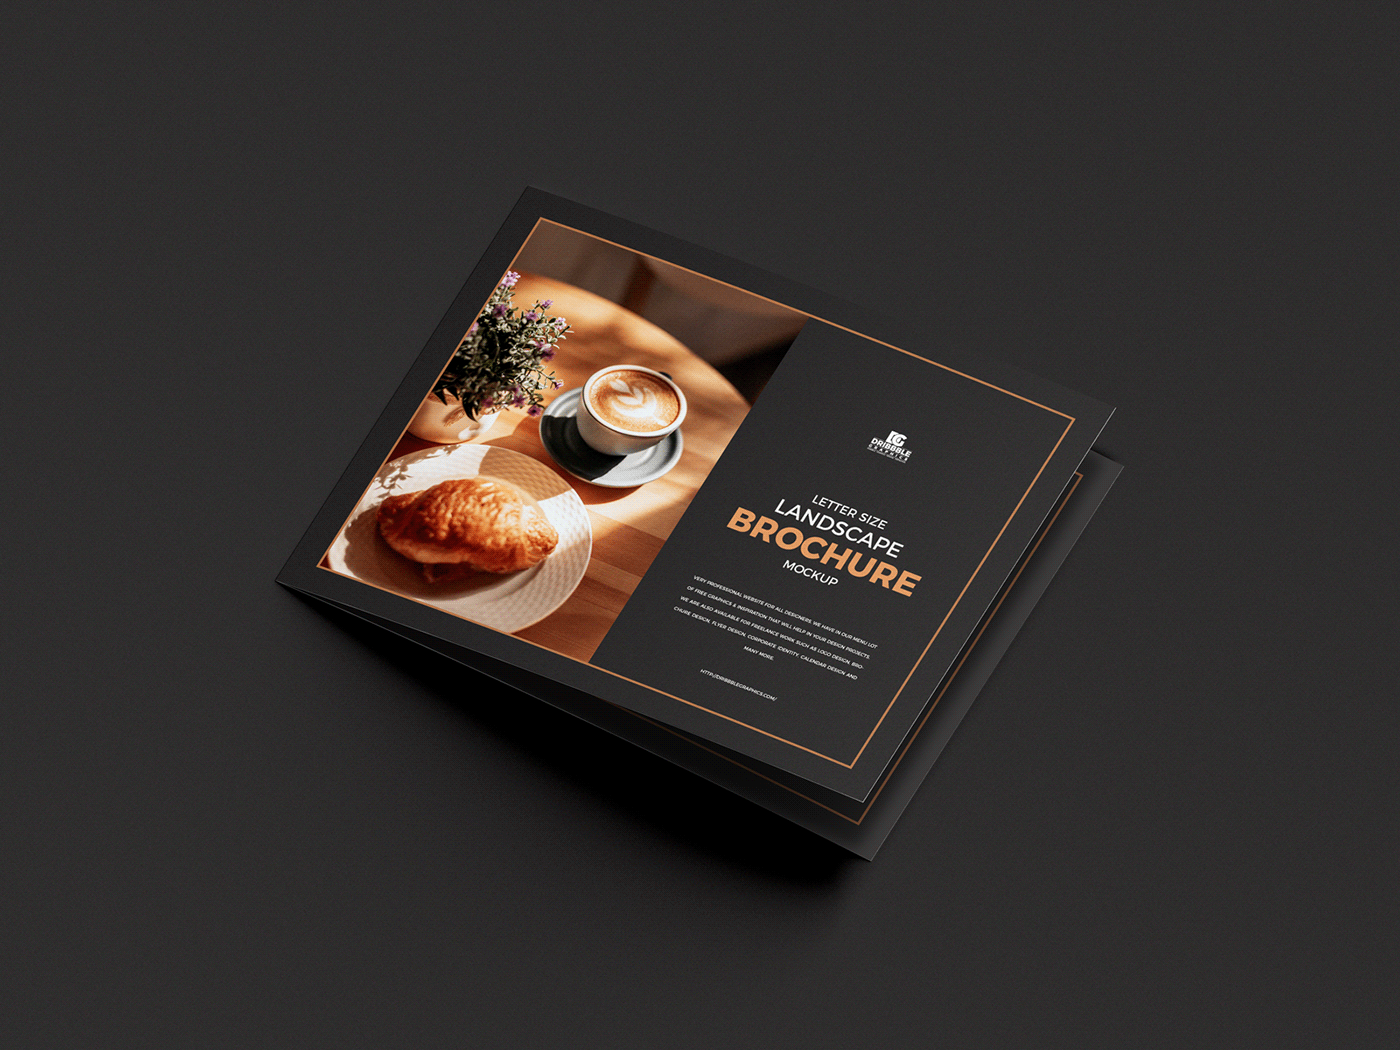 brochure design,brochure mockup,free mockup ,freebie,freebies,Mockup,mockup free,mockup psd,mockups,template